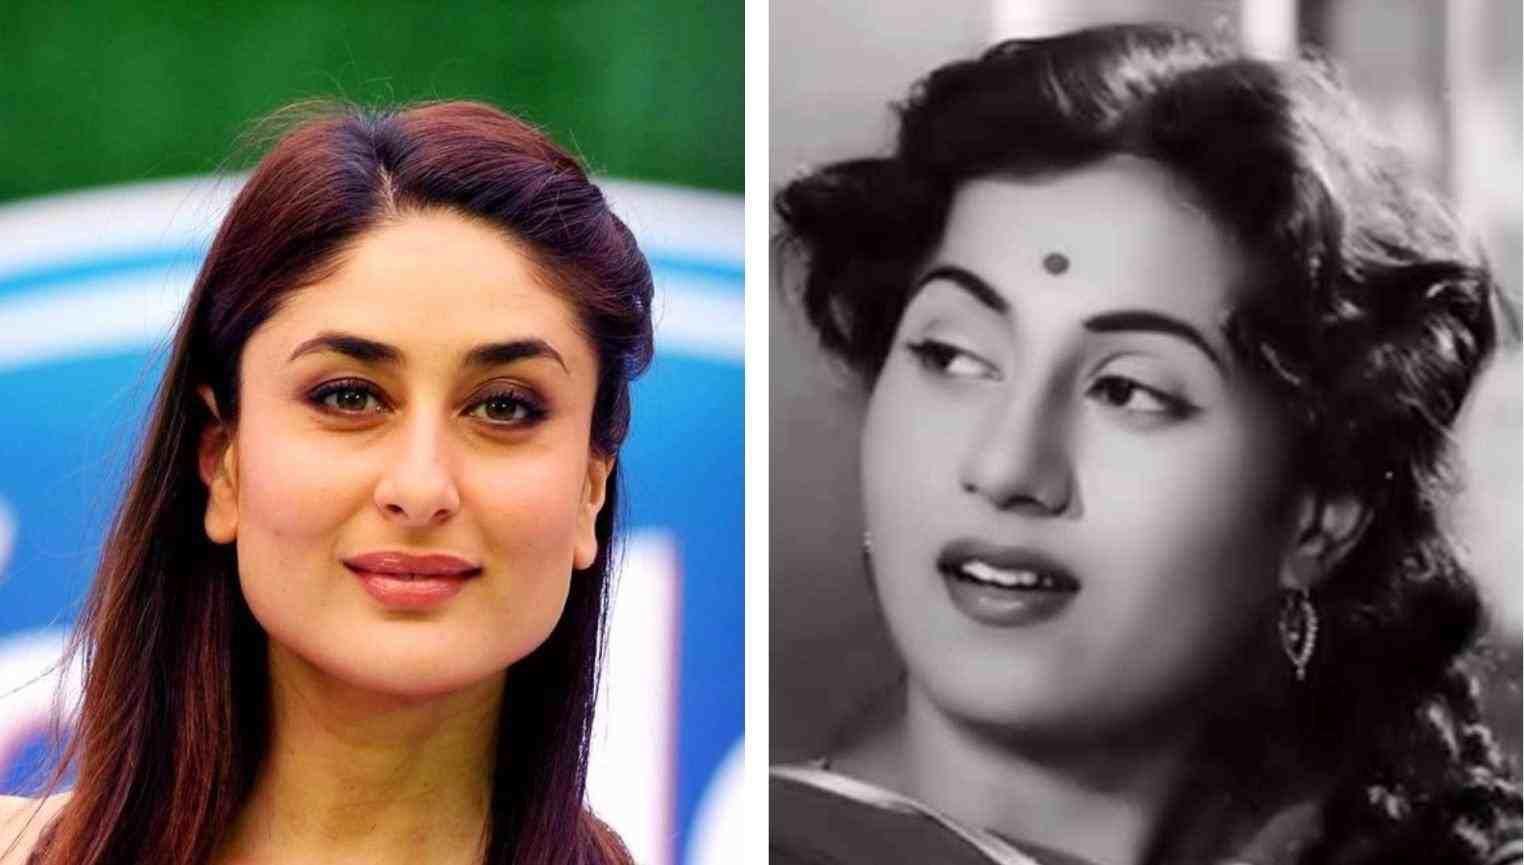 34+ Kareena Kapoor Haircut In Jab We Met